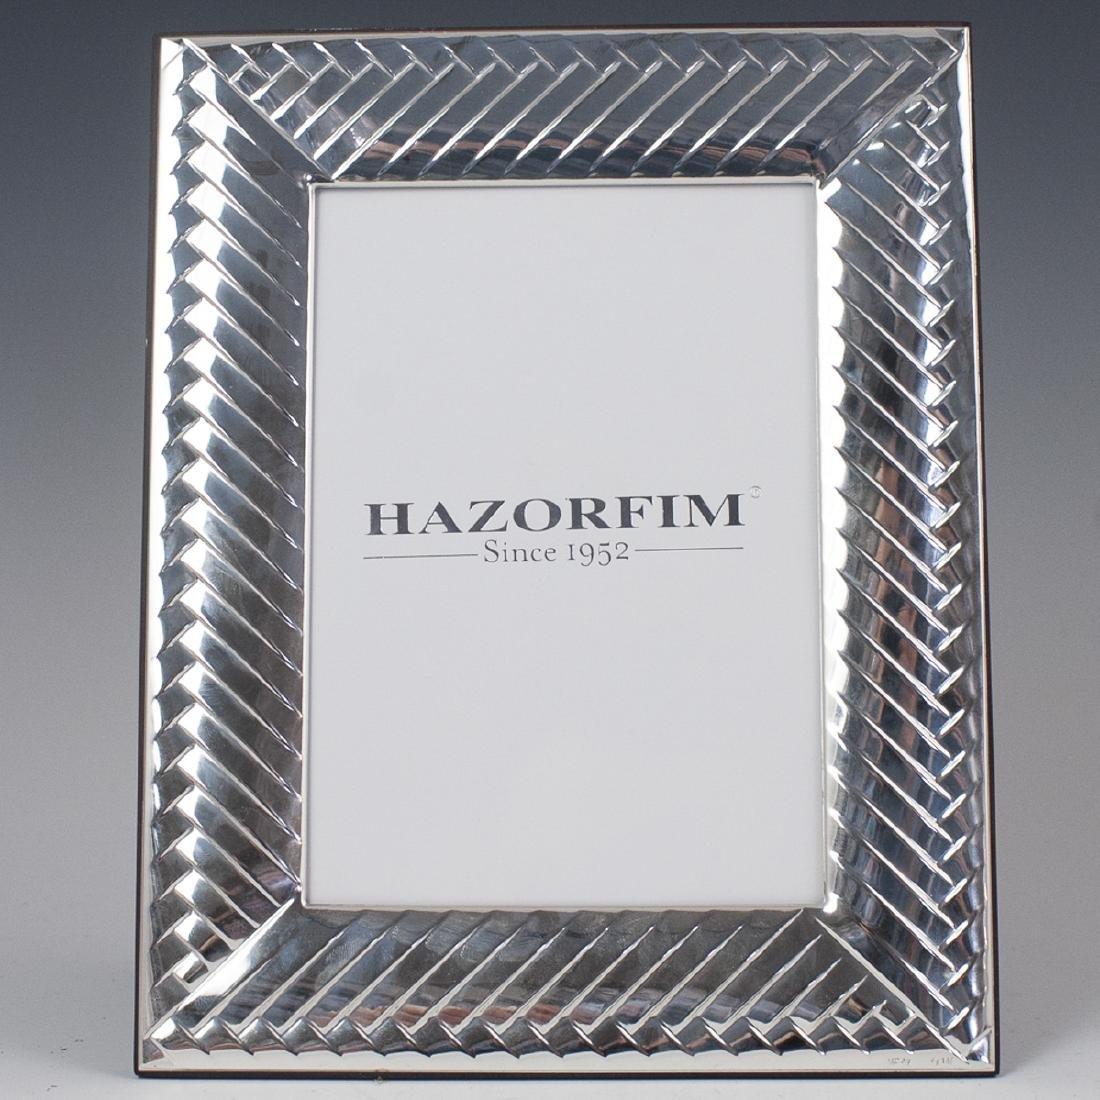 Hazorfim Sterling Picture Frame